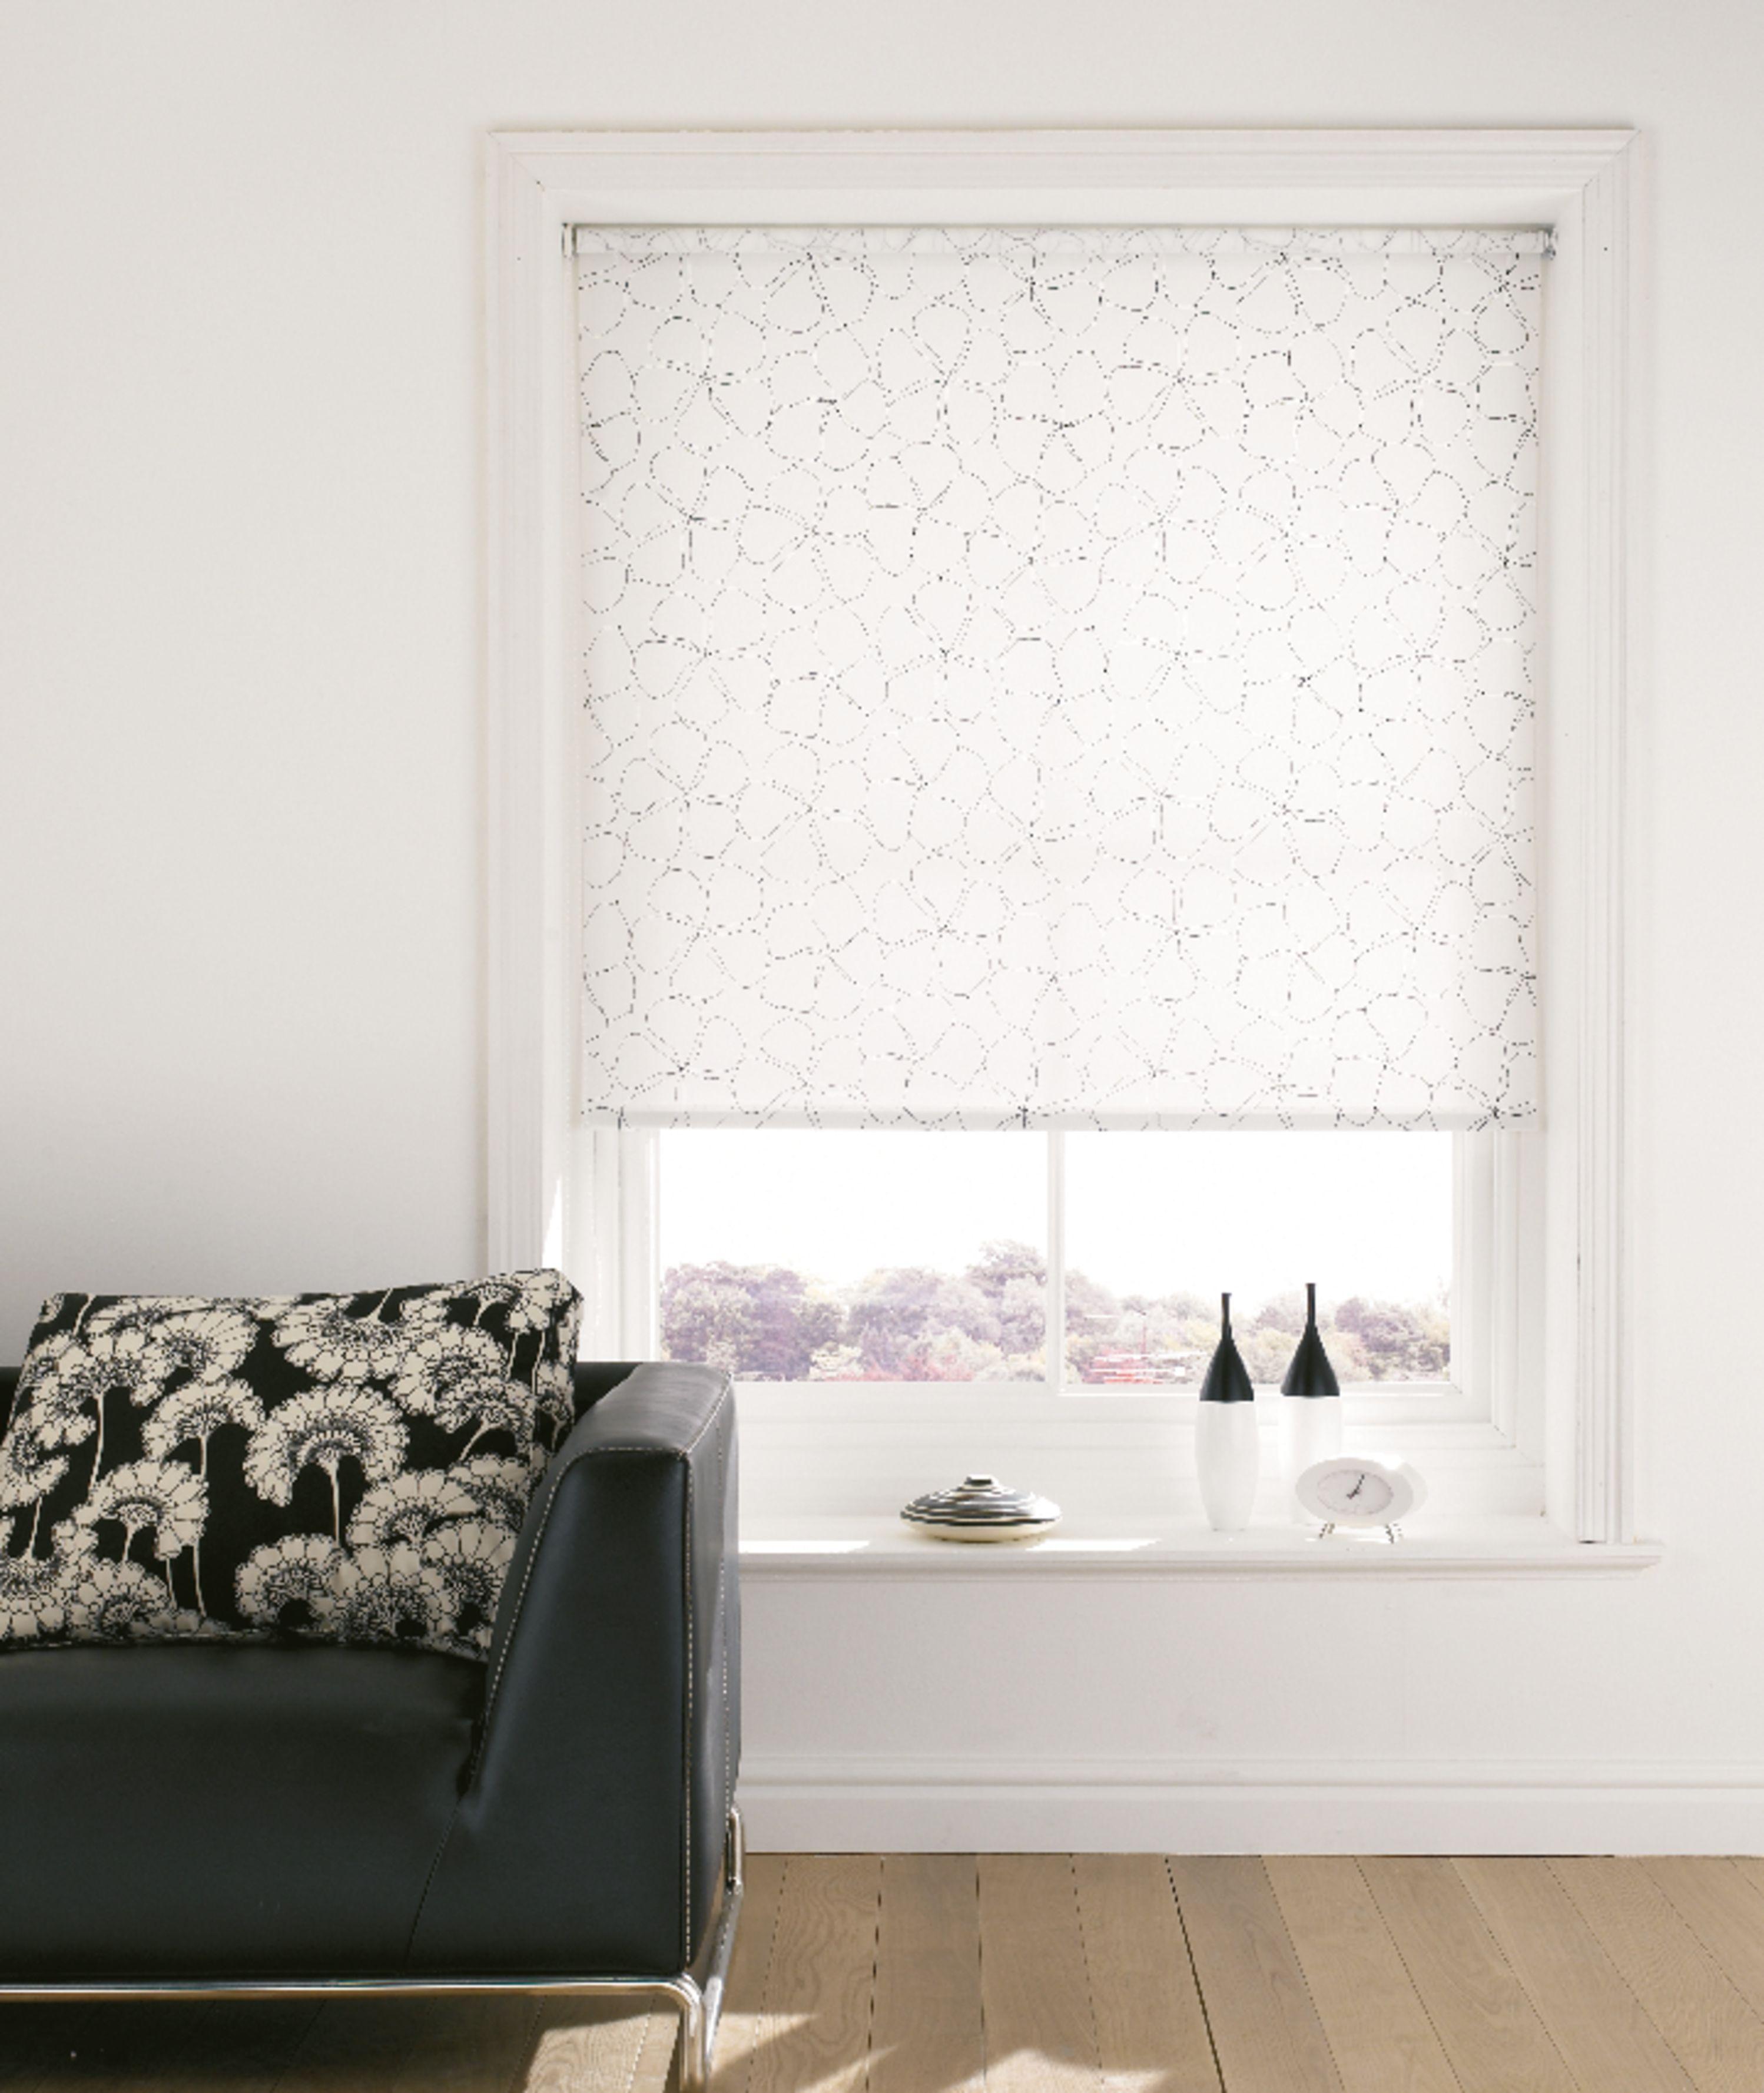 Amazing useful ideas fabric blinds drop cloths kitchen